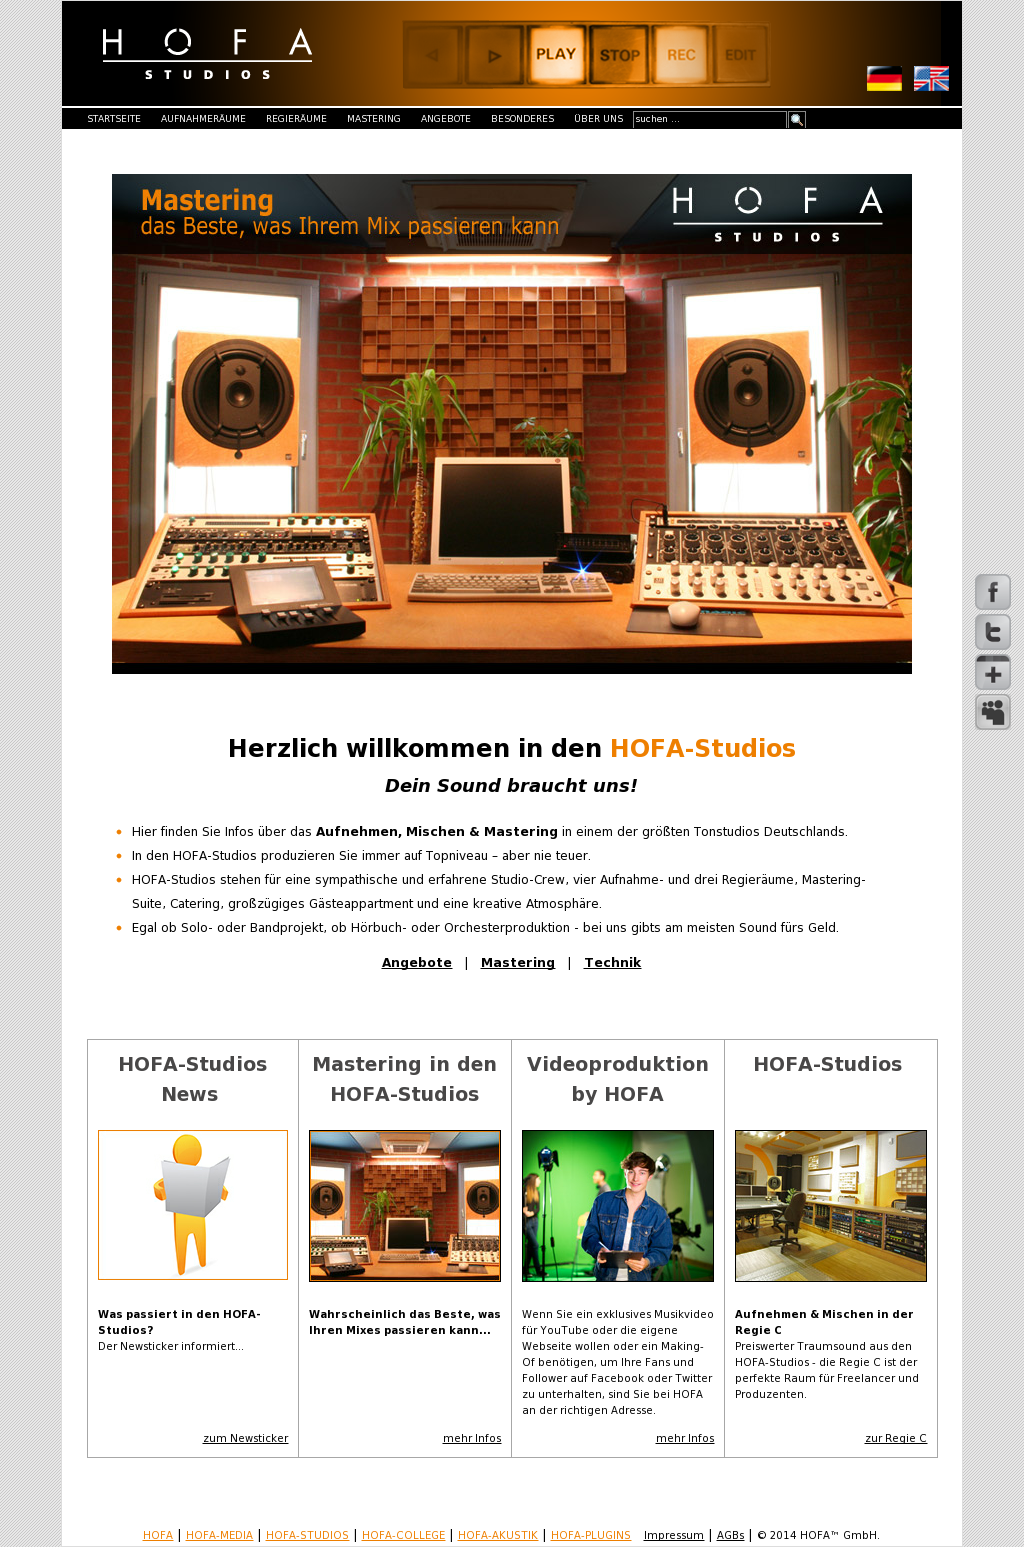 Hofa Studios Competitors, Revenue and Employees - Owler